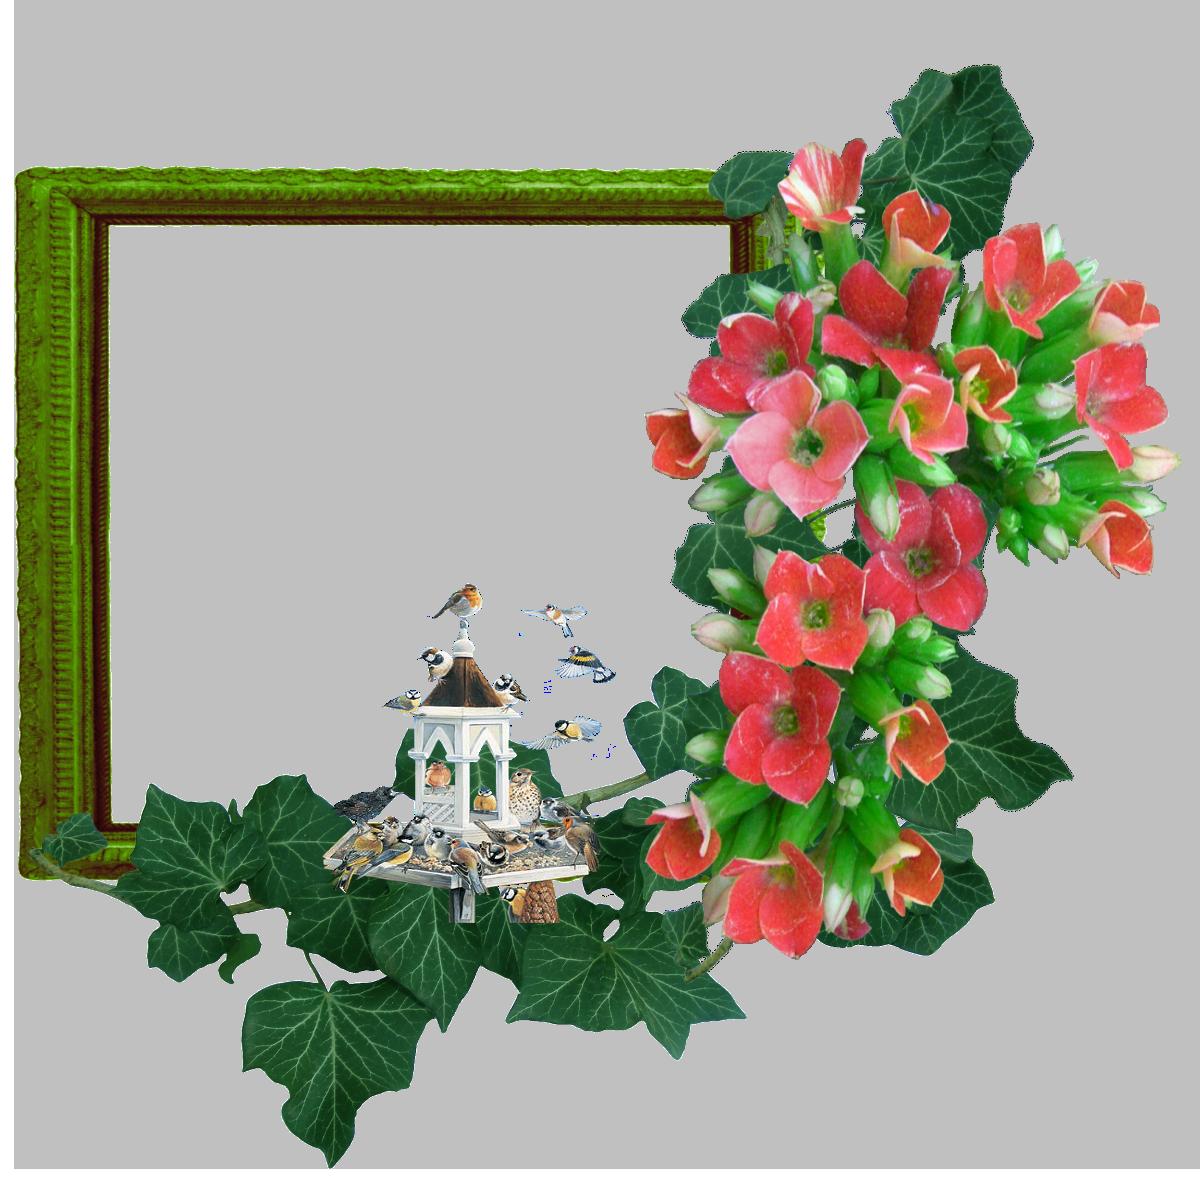 http://img-fotki.yandex.ru/get/6004/svetlera.c/0_4f7f8_da90ee4b_orig.png